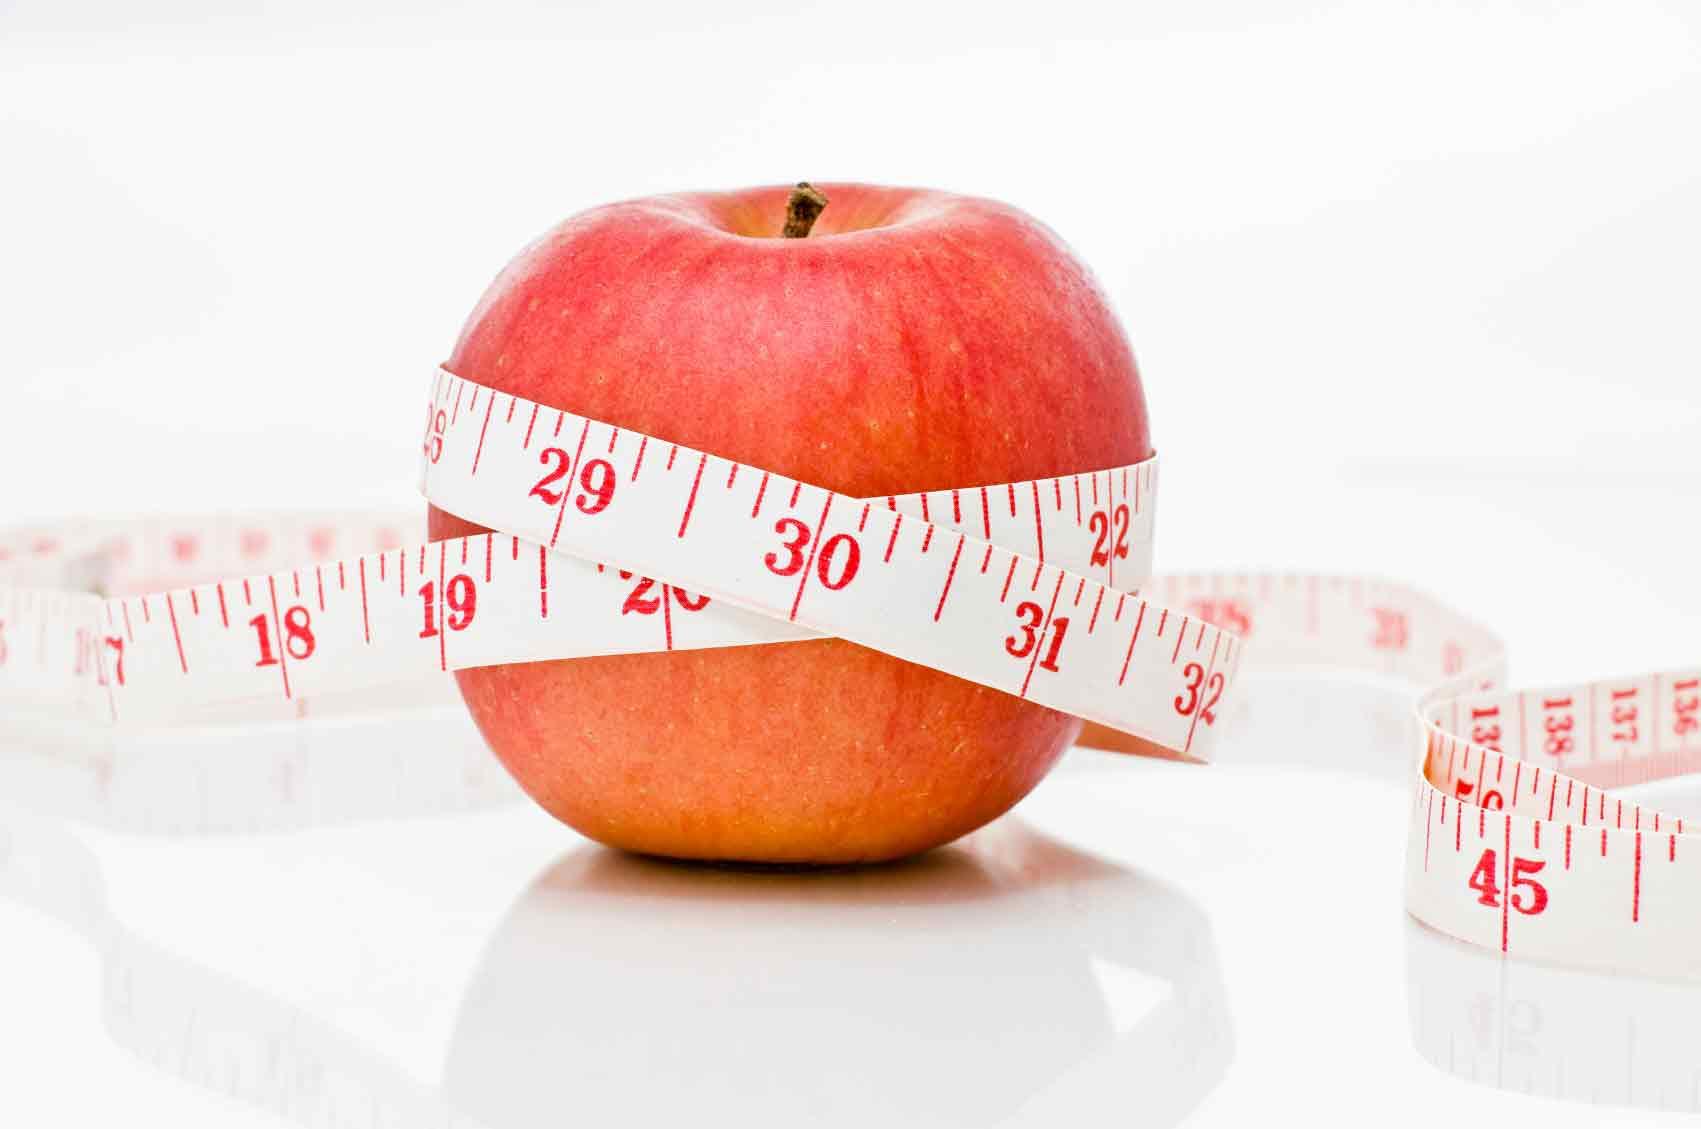 weight loss calculator - HD1701×1129